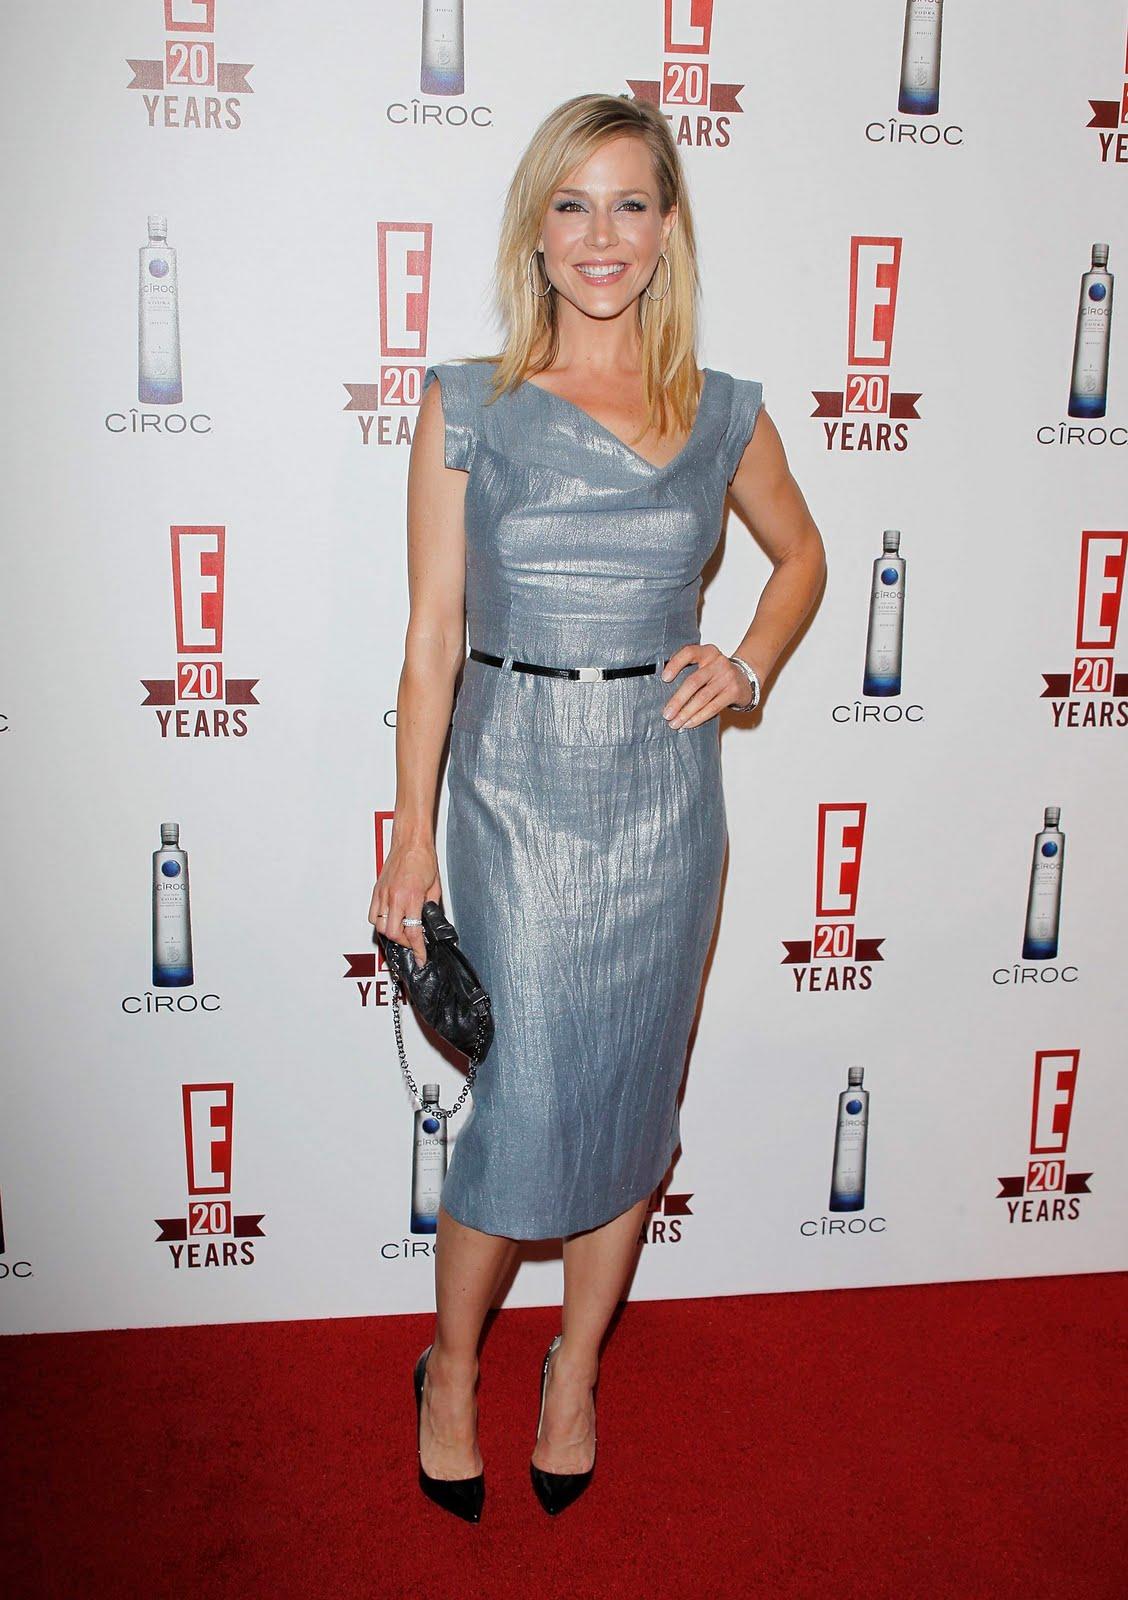 Julie Benz @ E! Entertainment's 20th Birthday Celebration